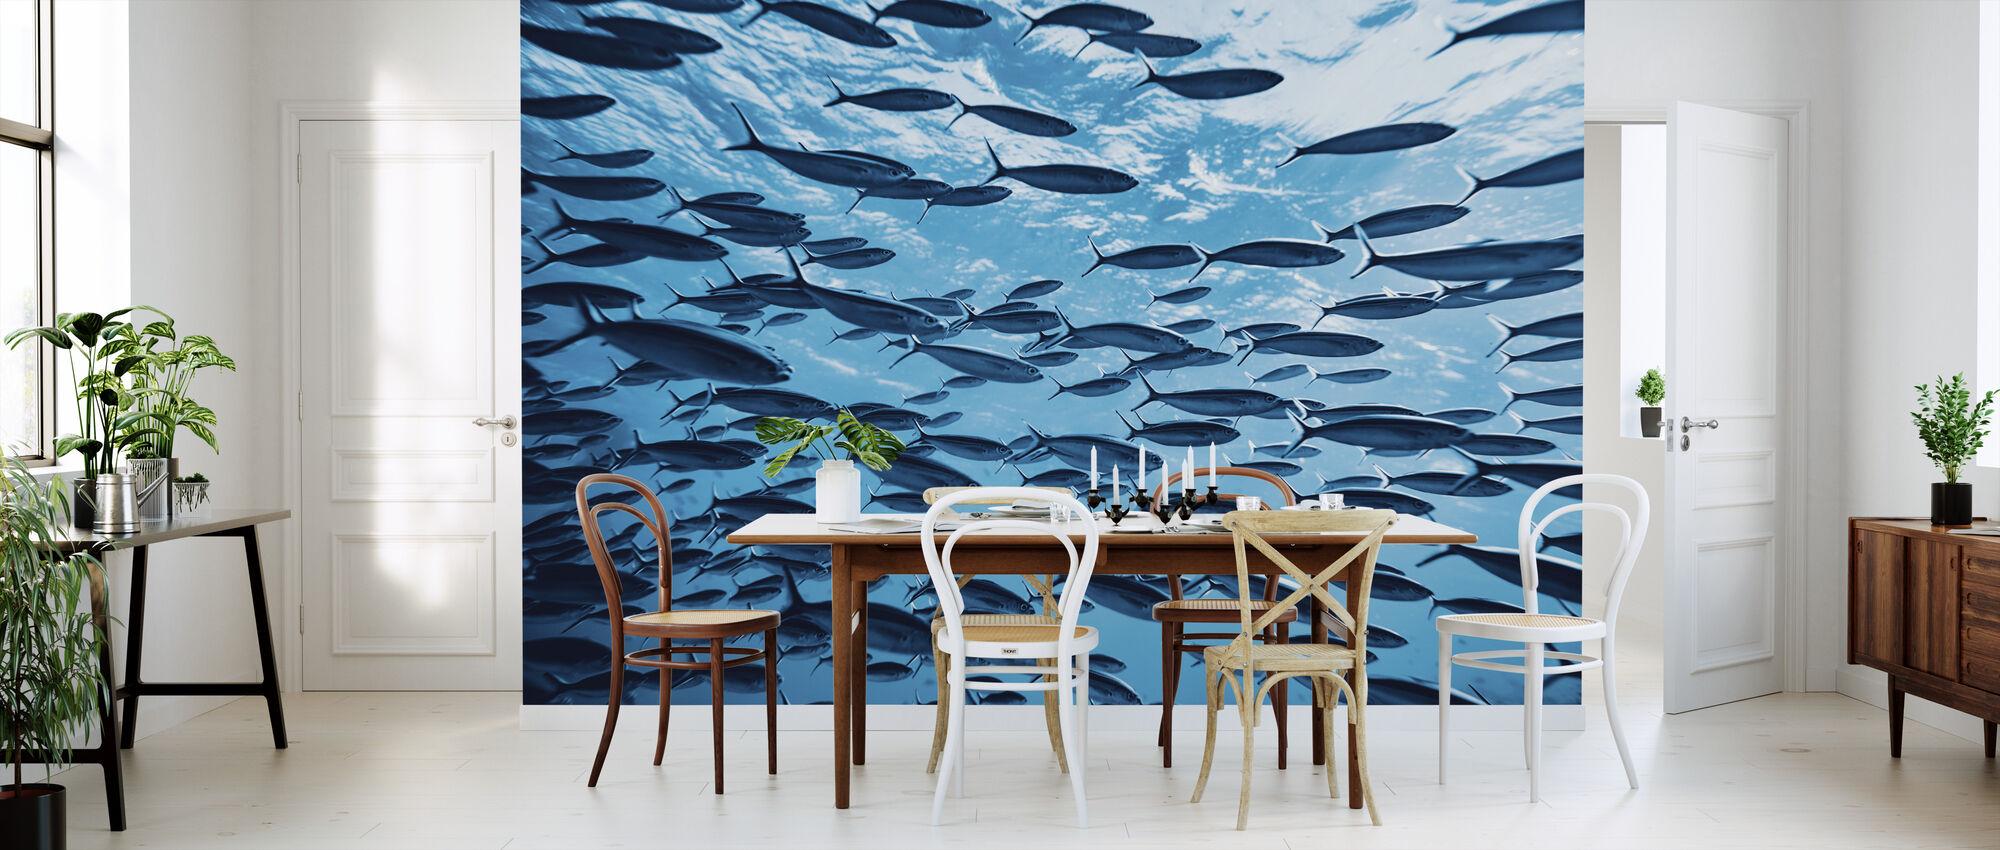 Tropical Fishes Underwater - Wallpaper - Kitchen